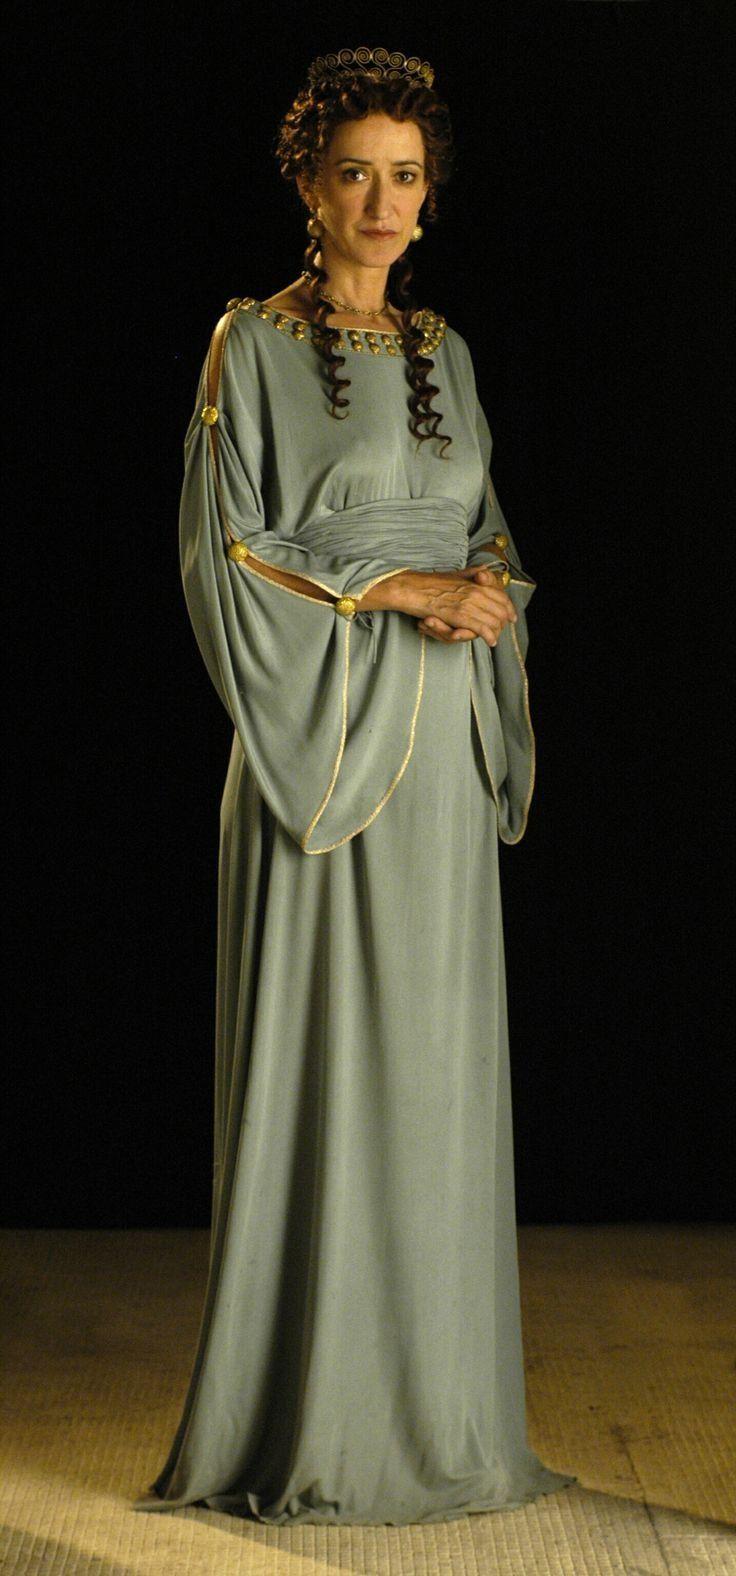 A High Class Roman gown, made of finer fabric such as linen …